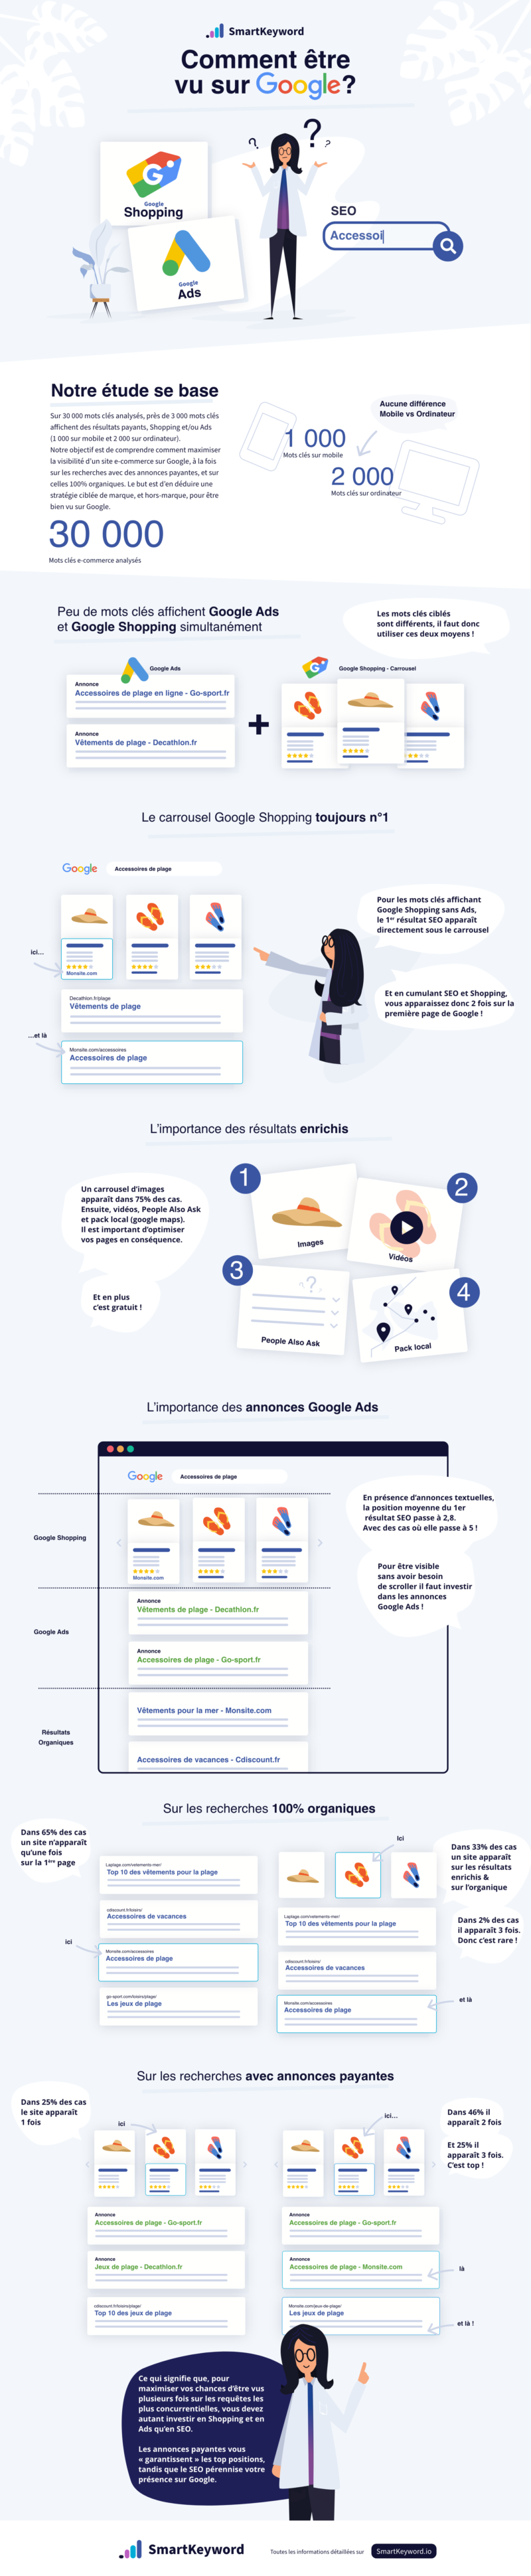 SEO - SEA - etude ecommerce - etre vu sur Google - infographie - SmartKeyword